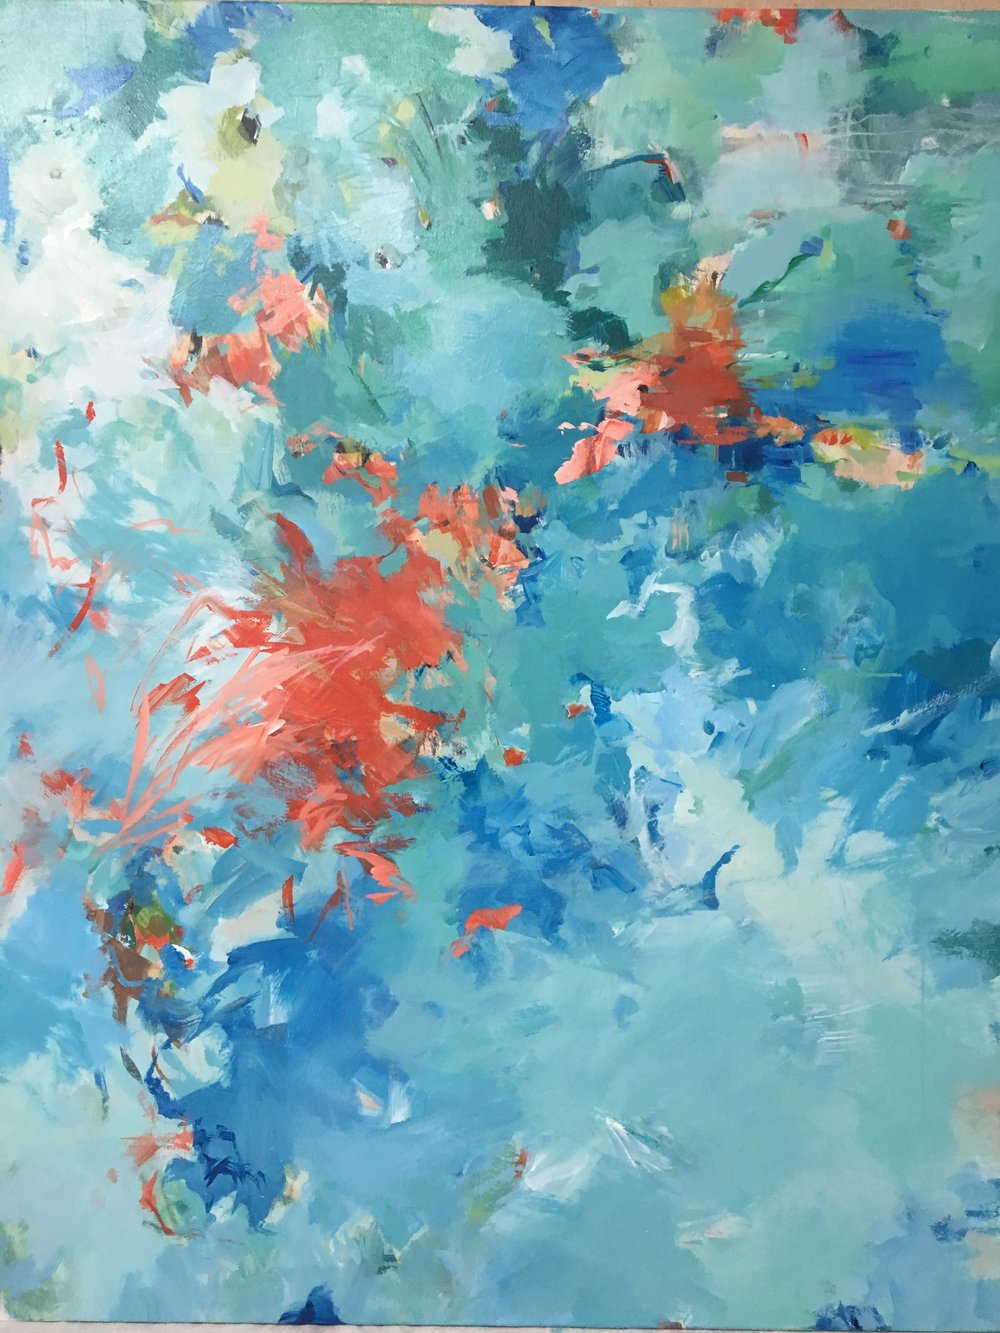 Bergamot 48 x 60 (mixed media on canvas)